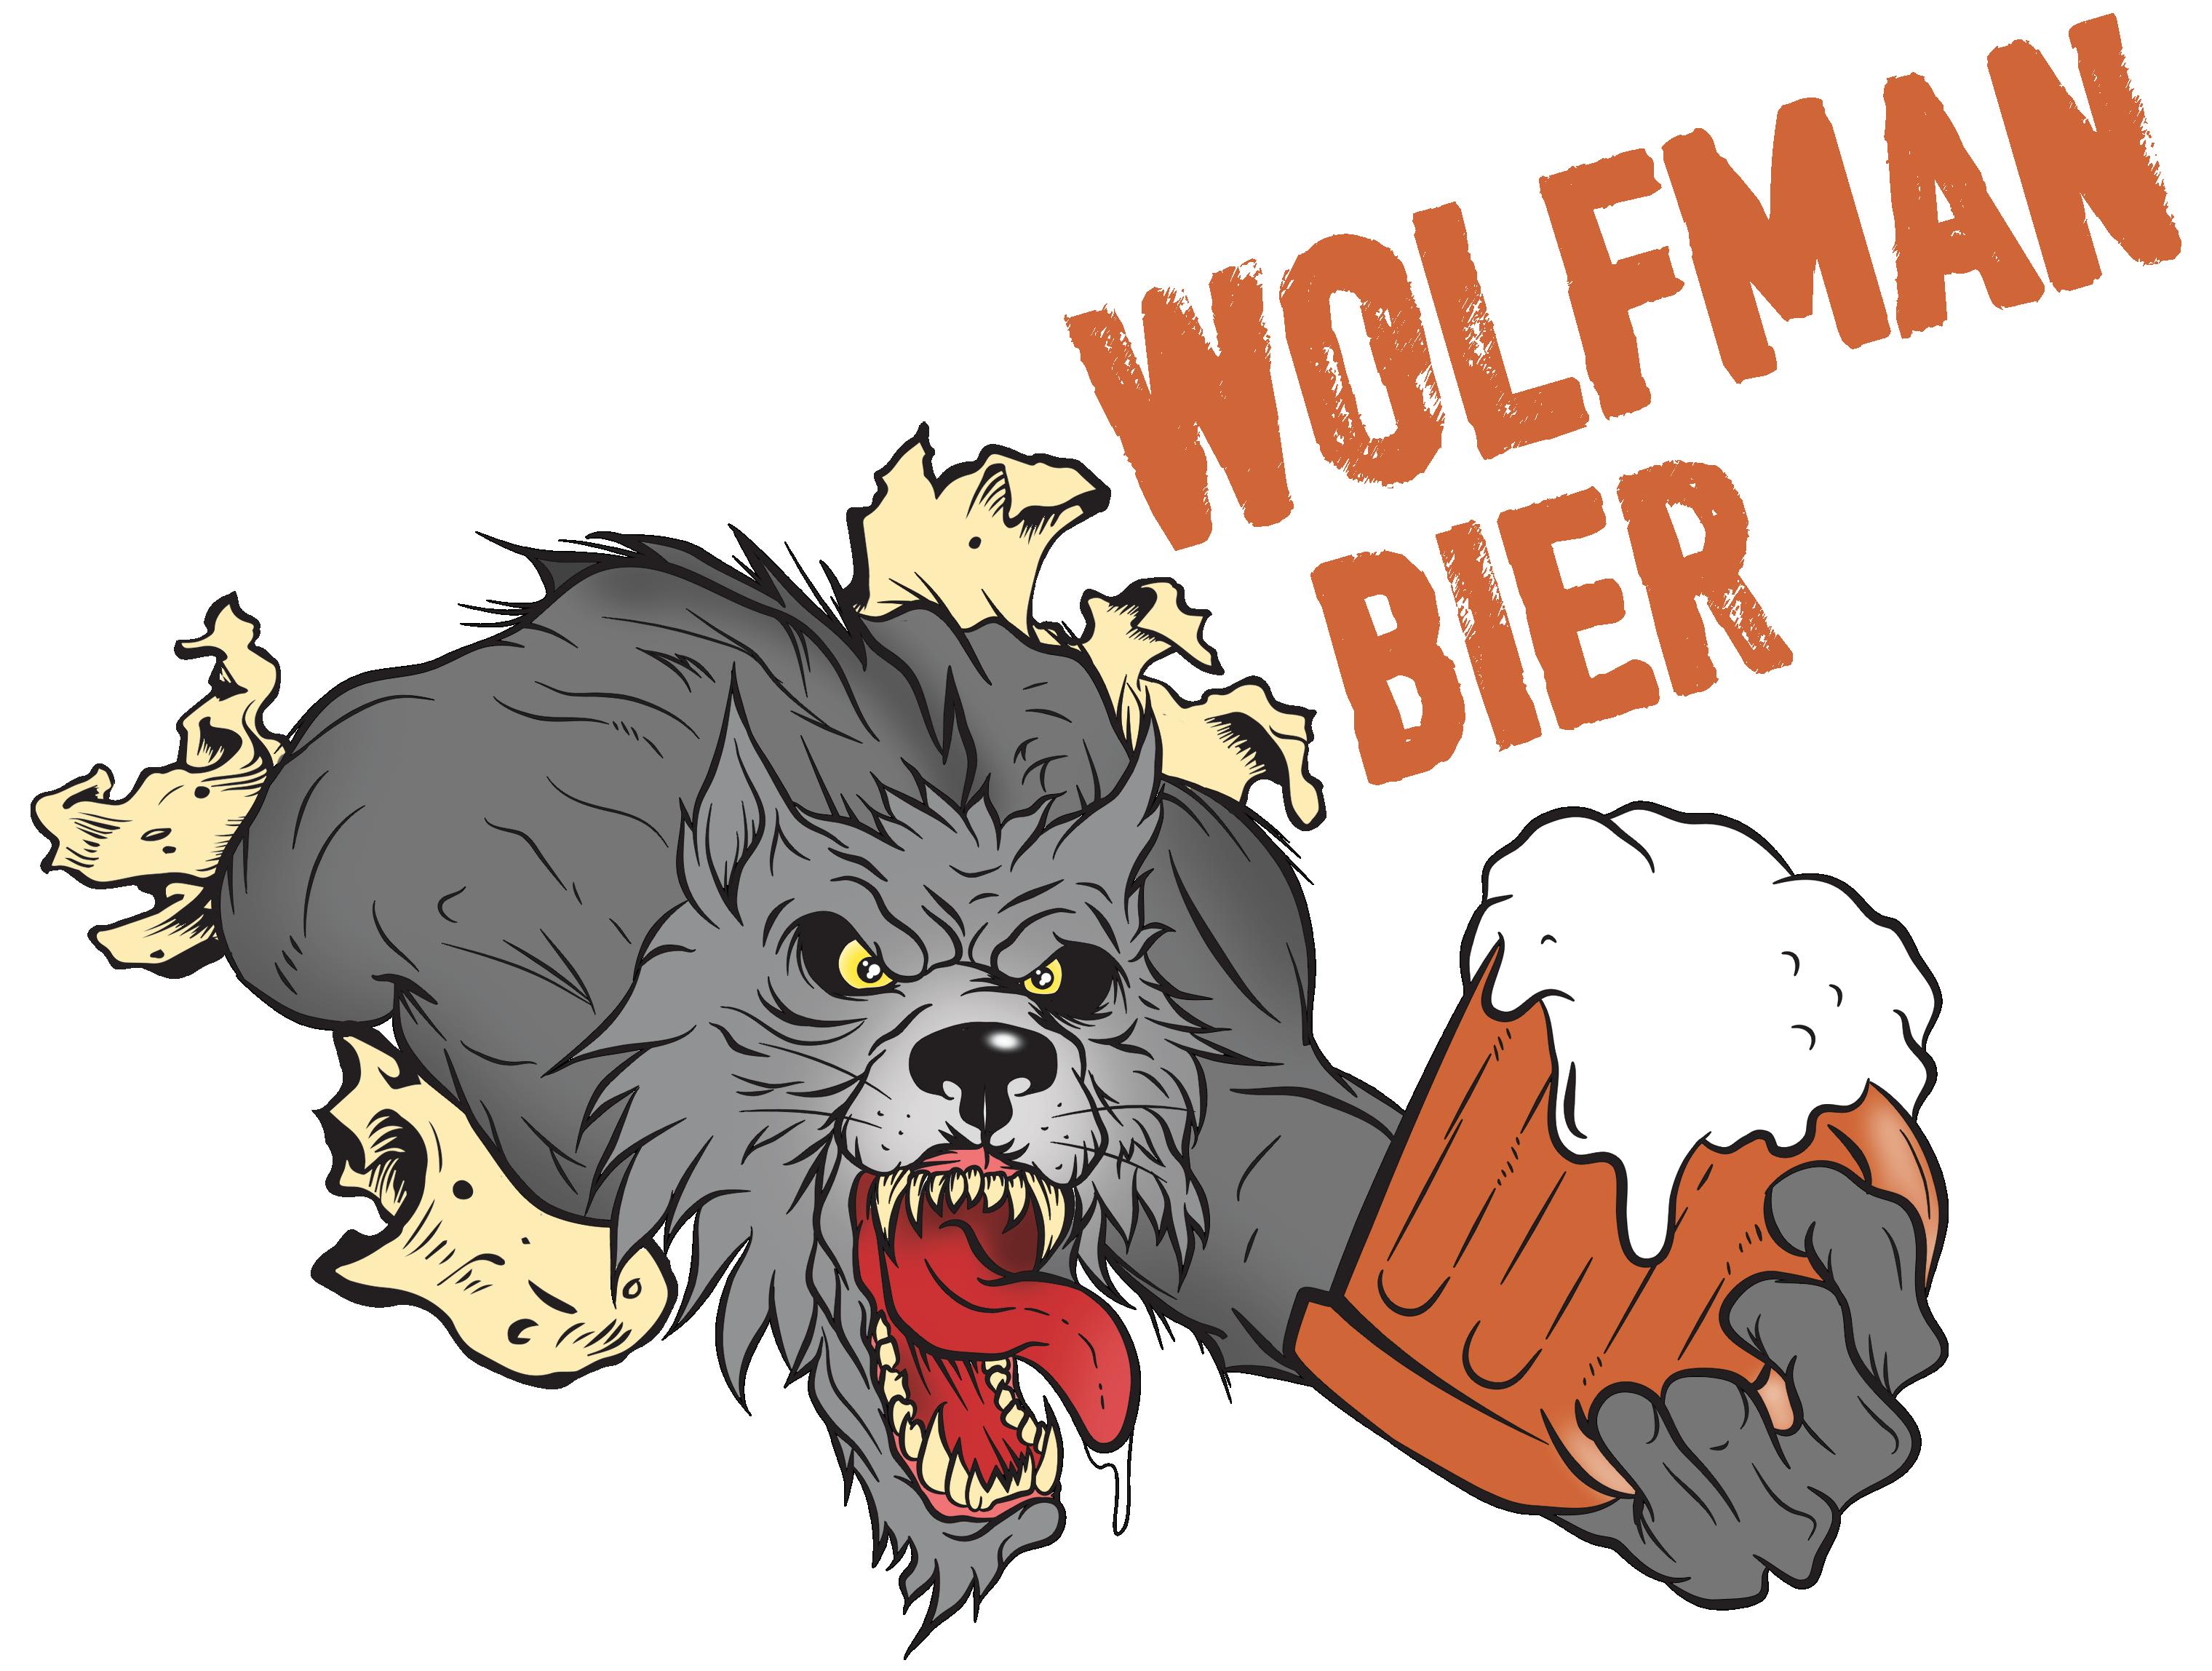 Wolfman Bier